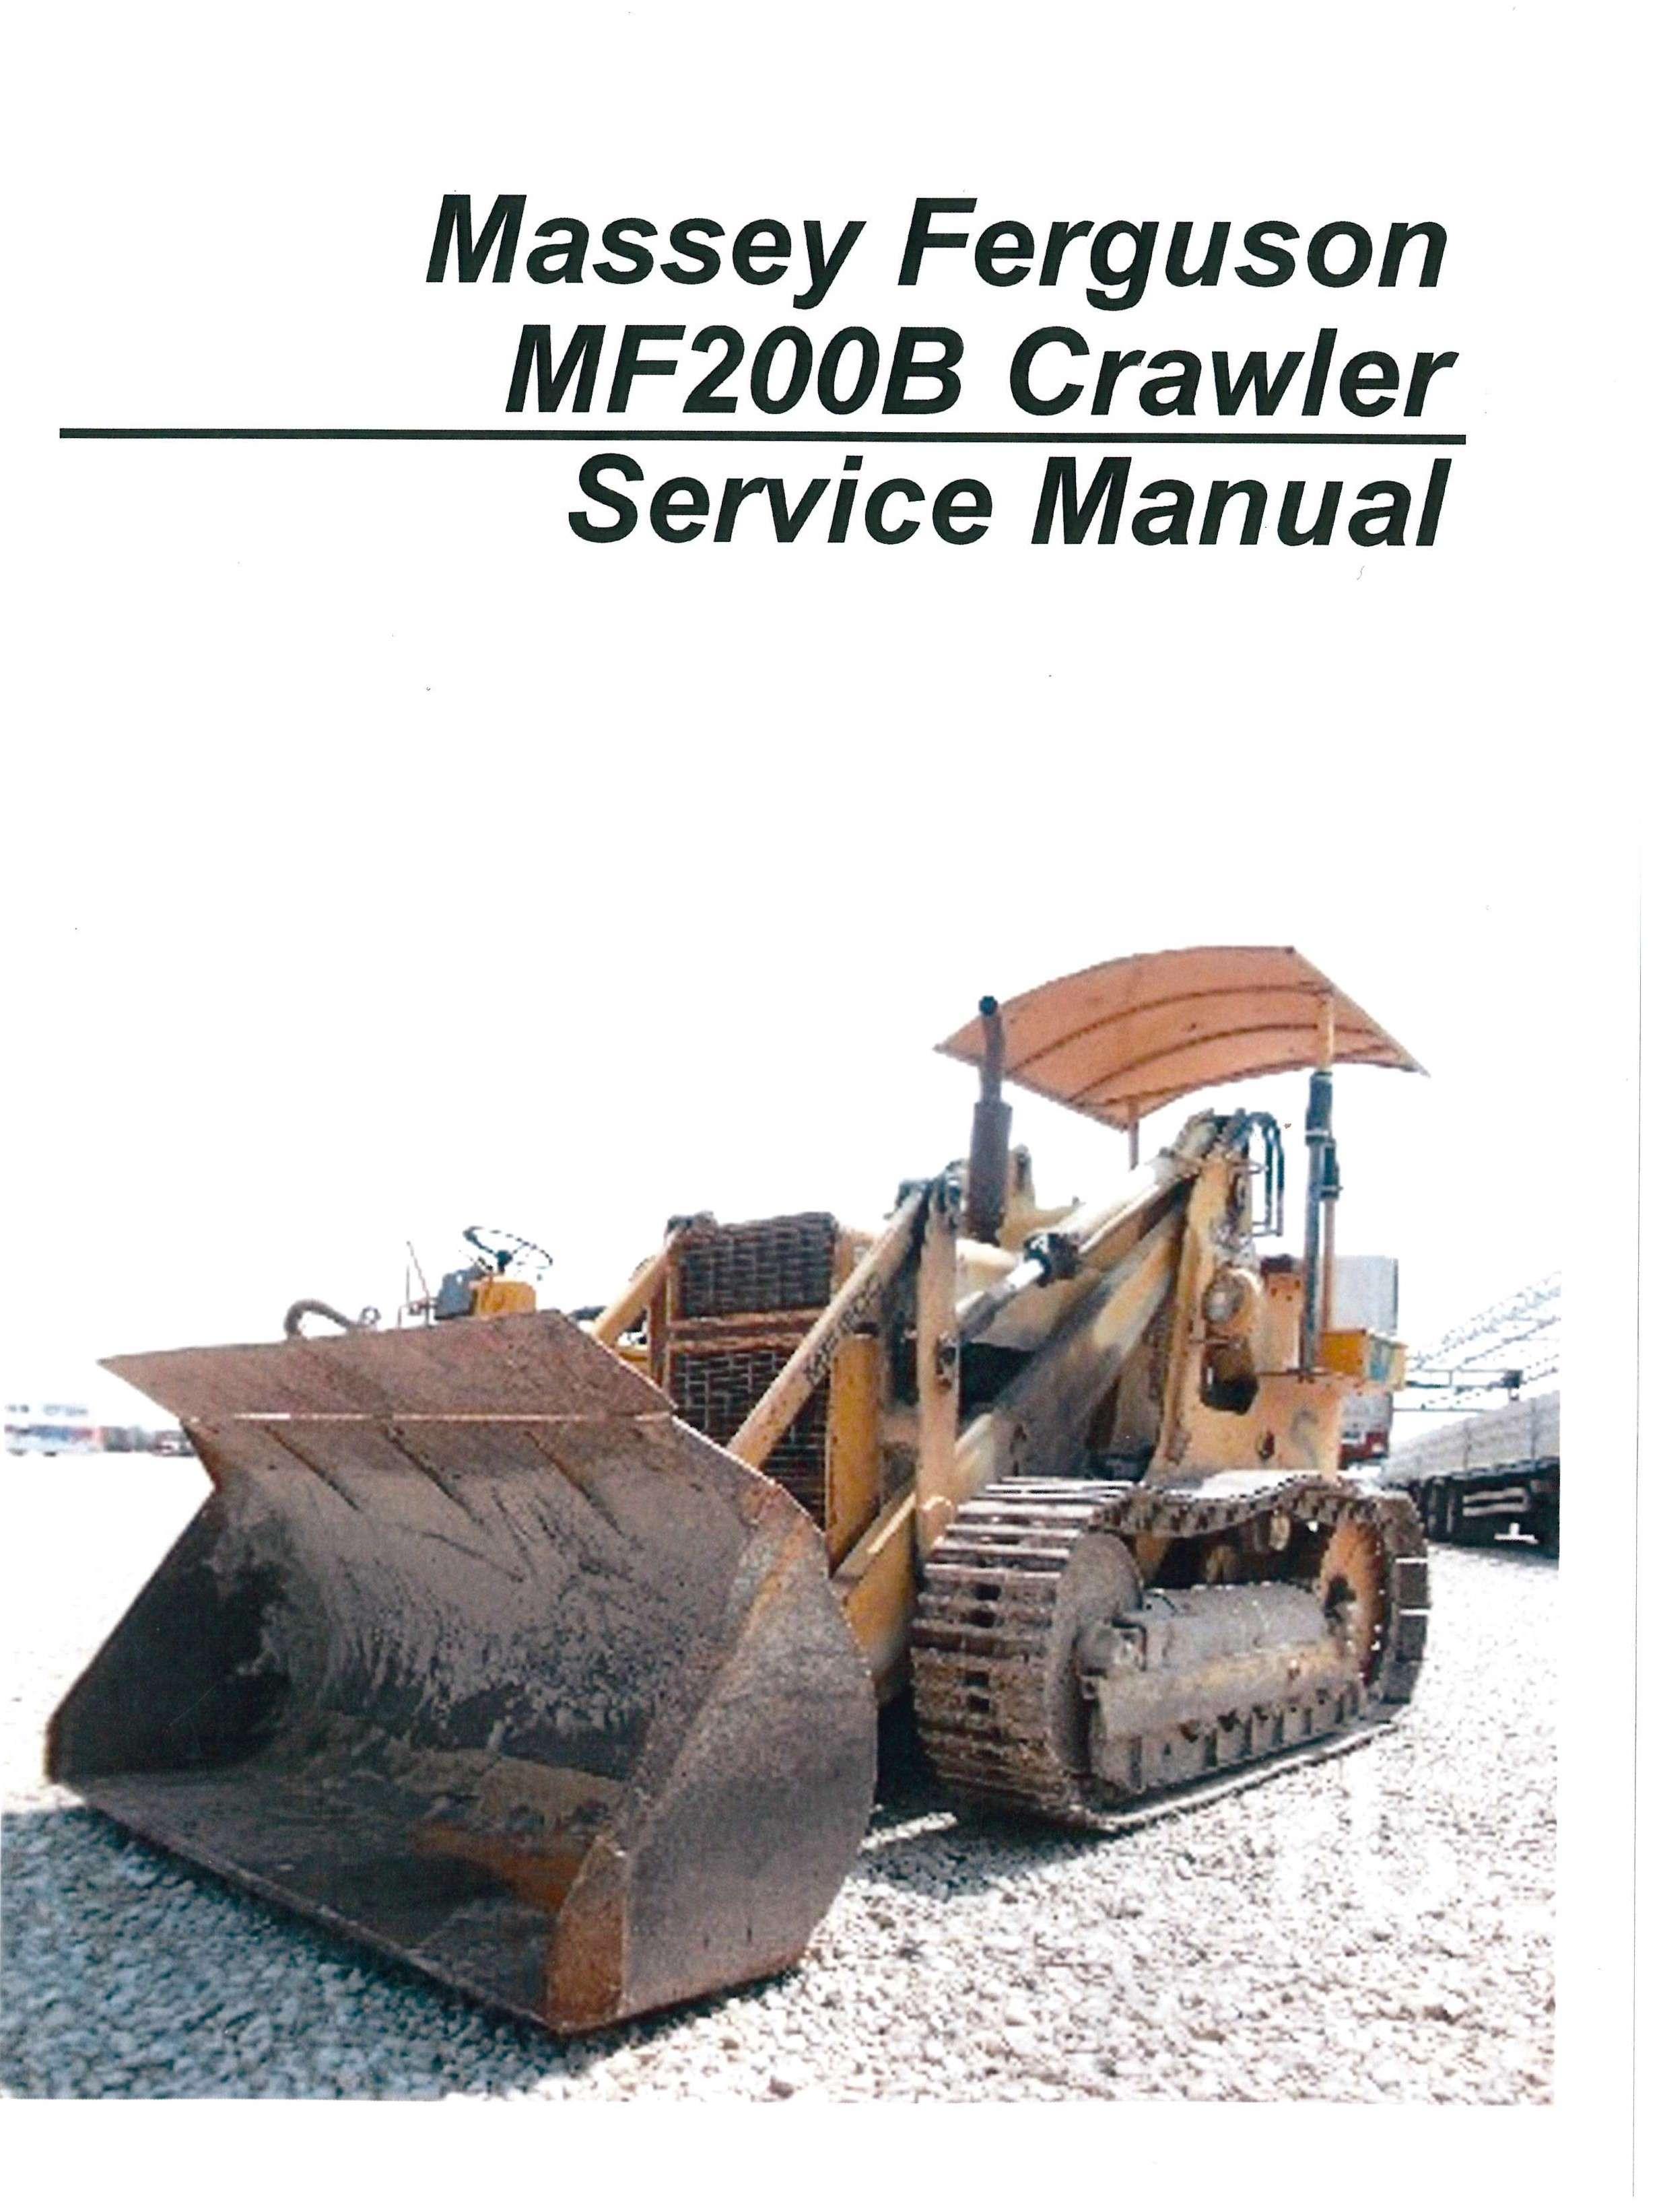 Massey-Ferguson-MF200-MF200B-Crawler-Service-Manual_001.jpg ...